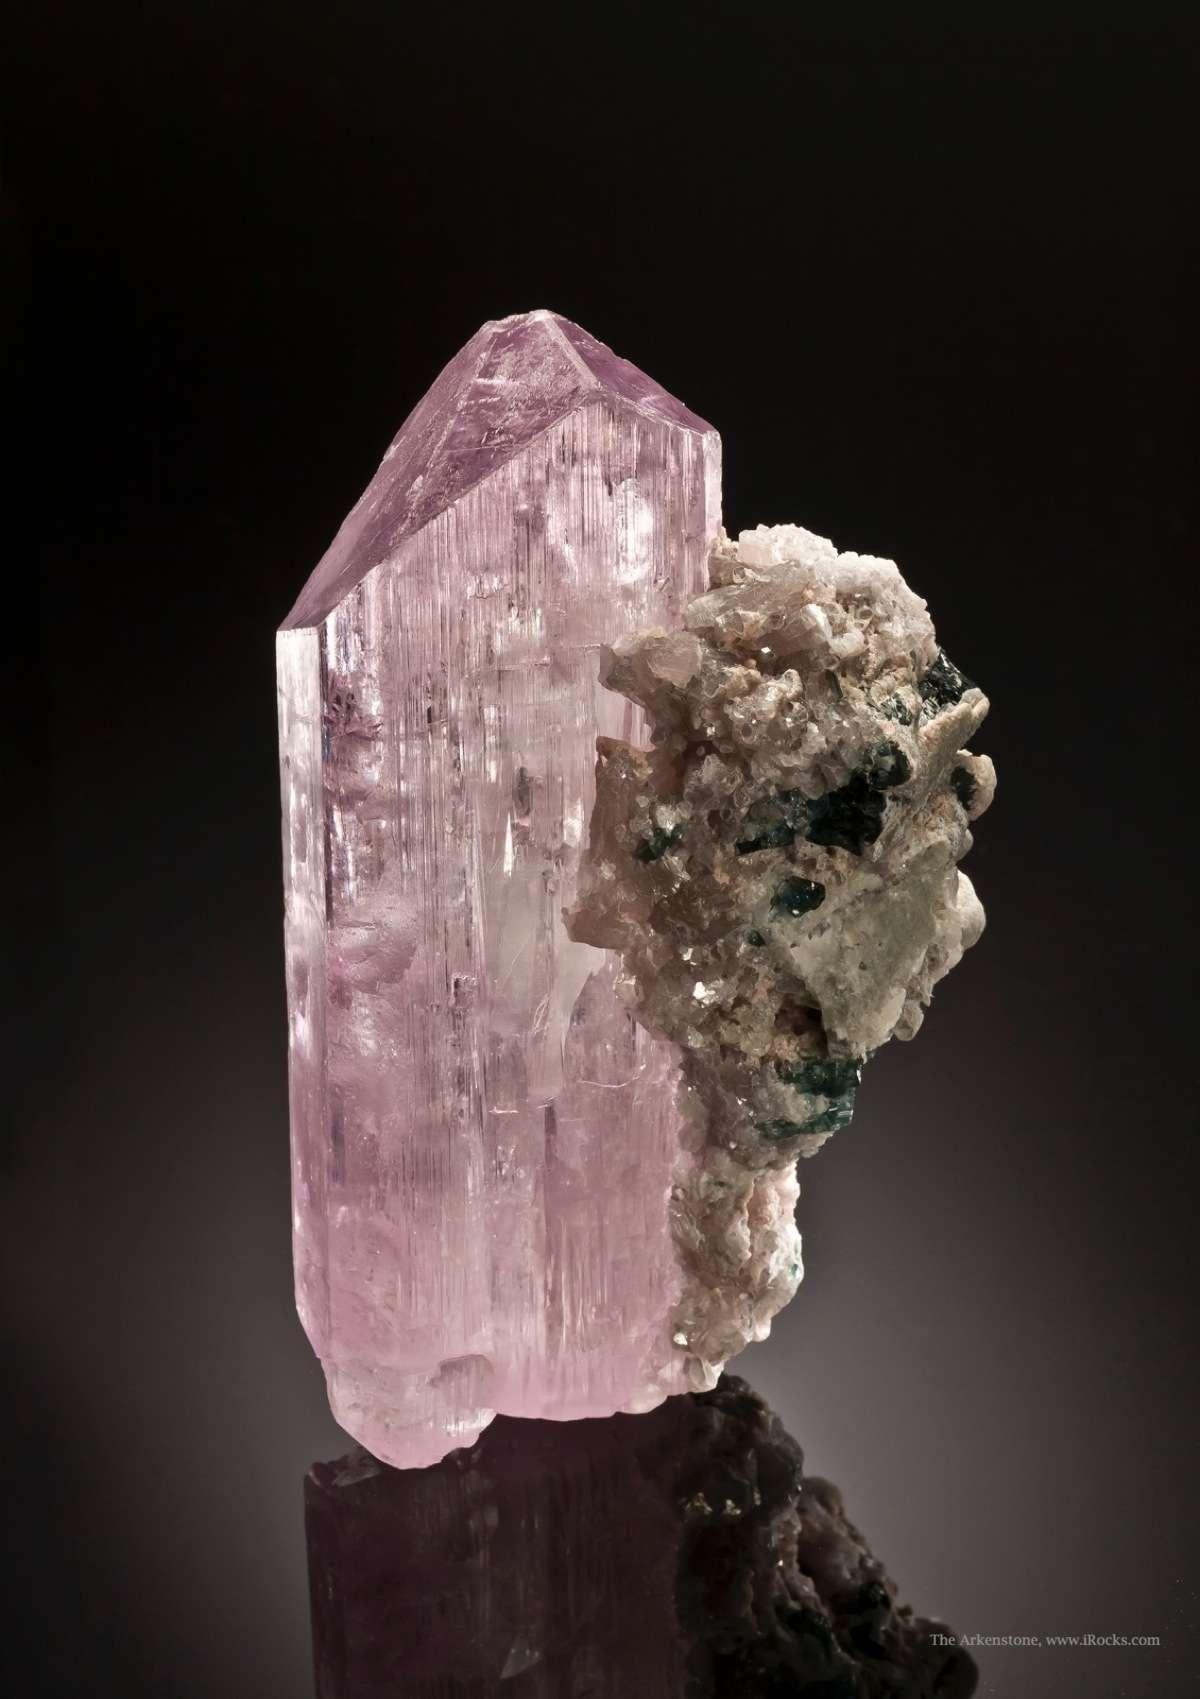 A dramatic kunzite crystal showing unusually fine sharp termination